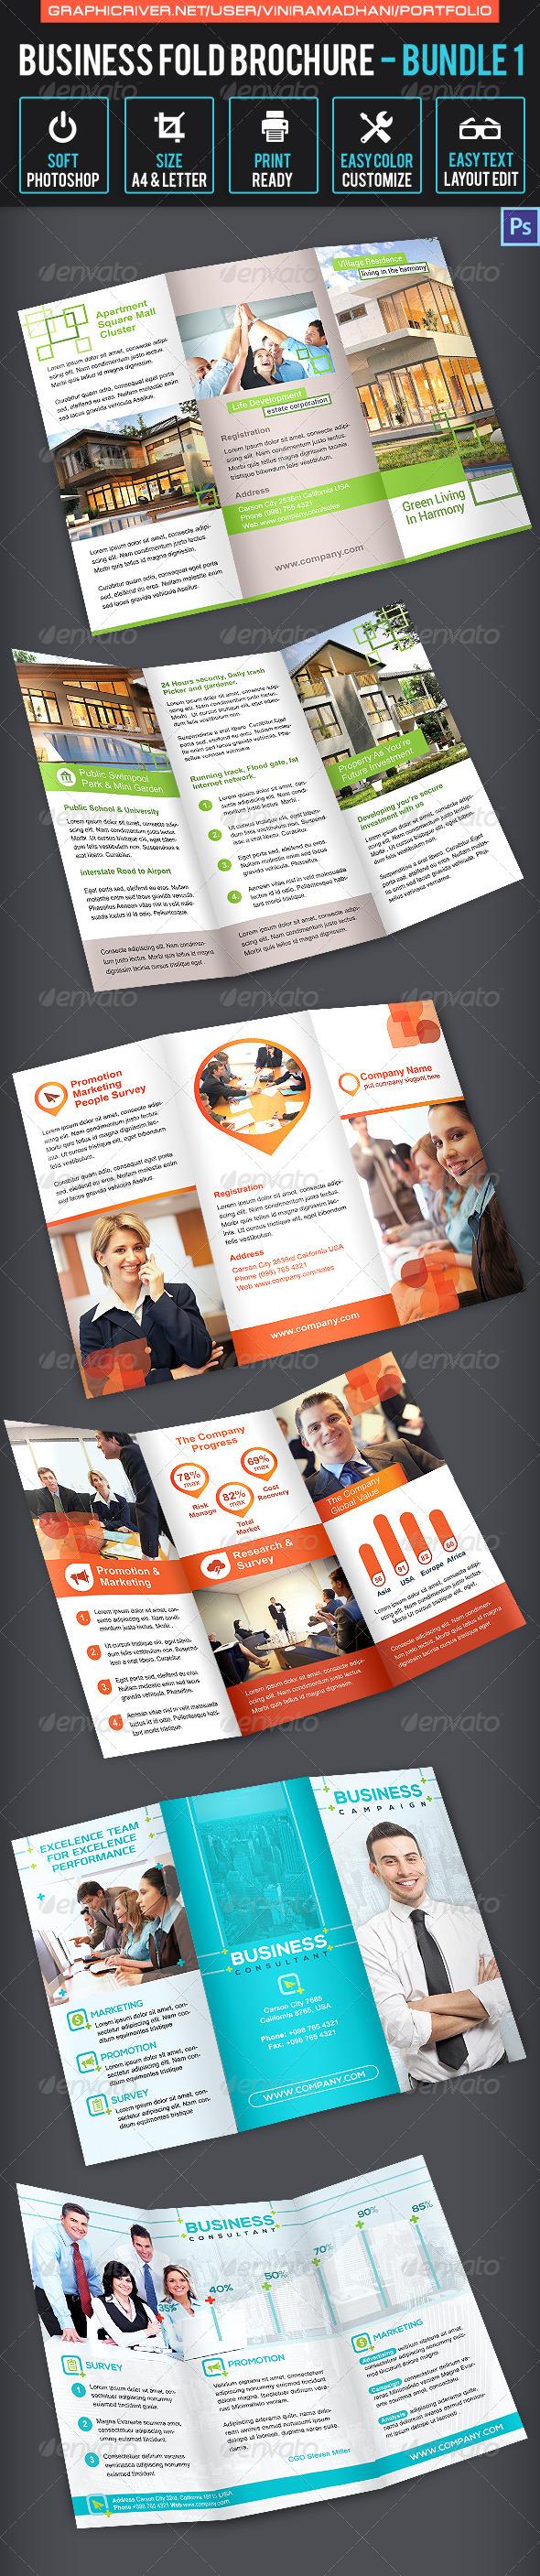 Business Trifold Brochure Bundle 1 - Corporate Brochures